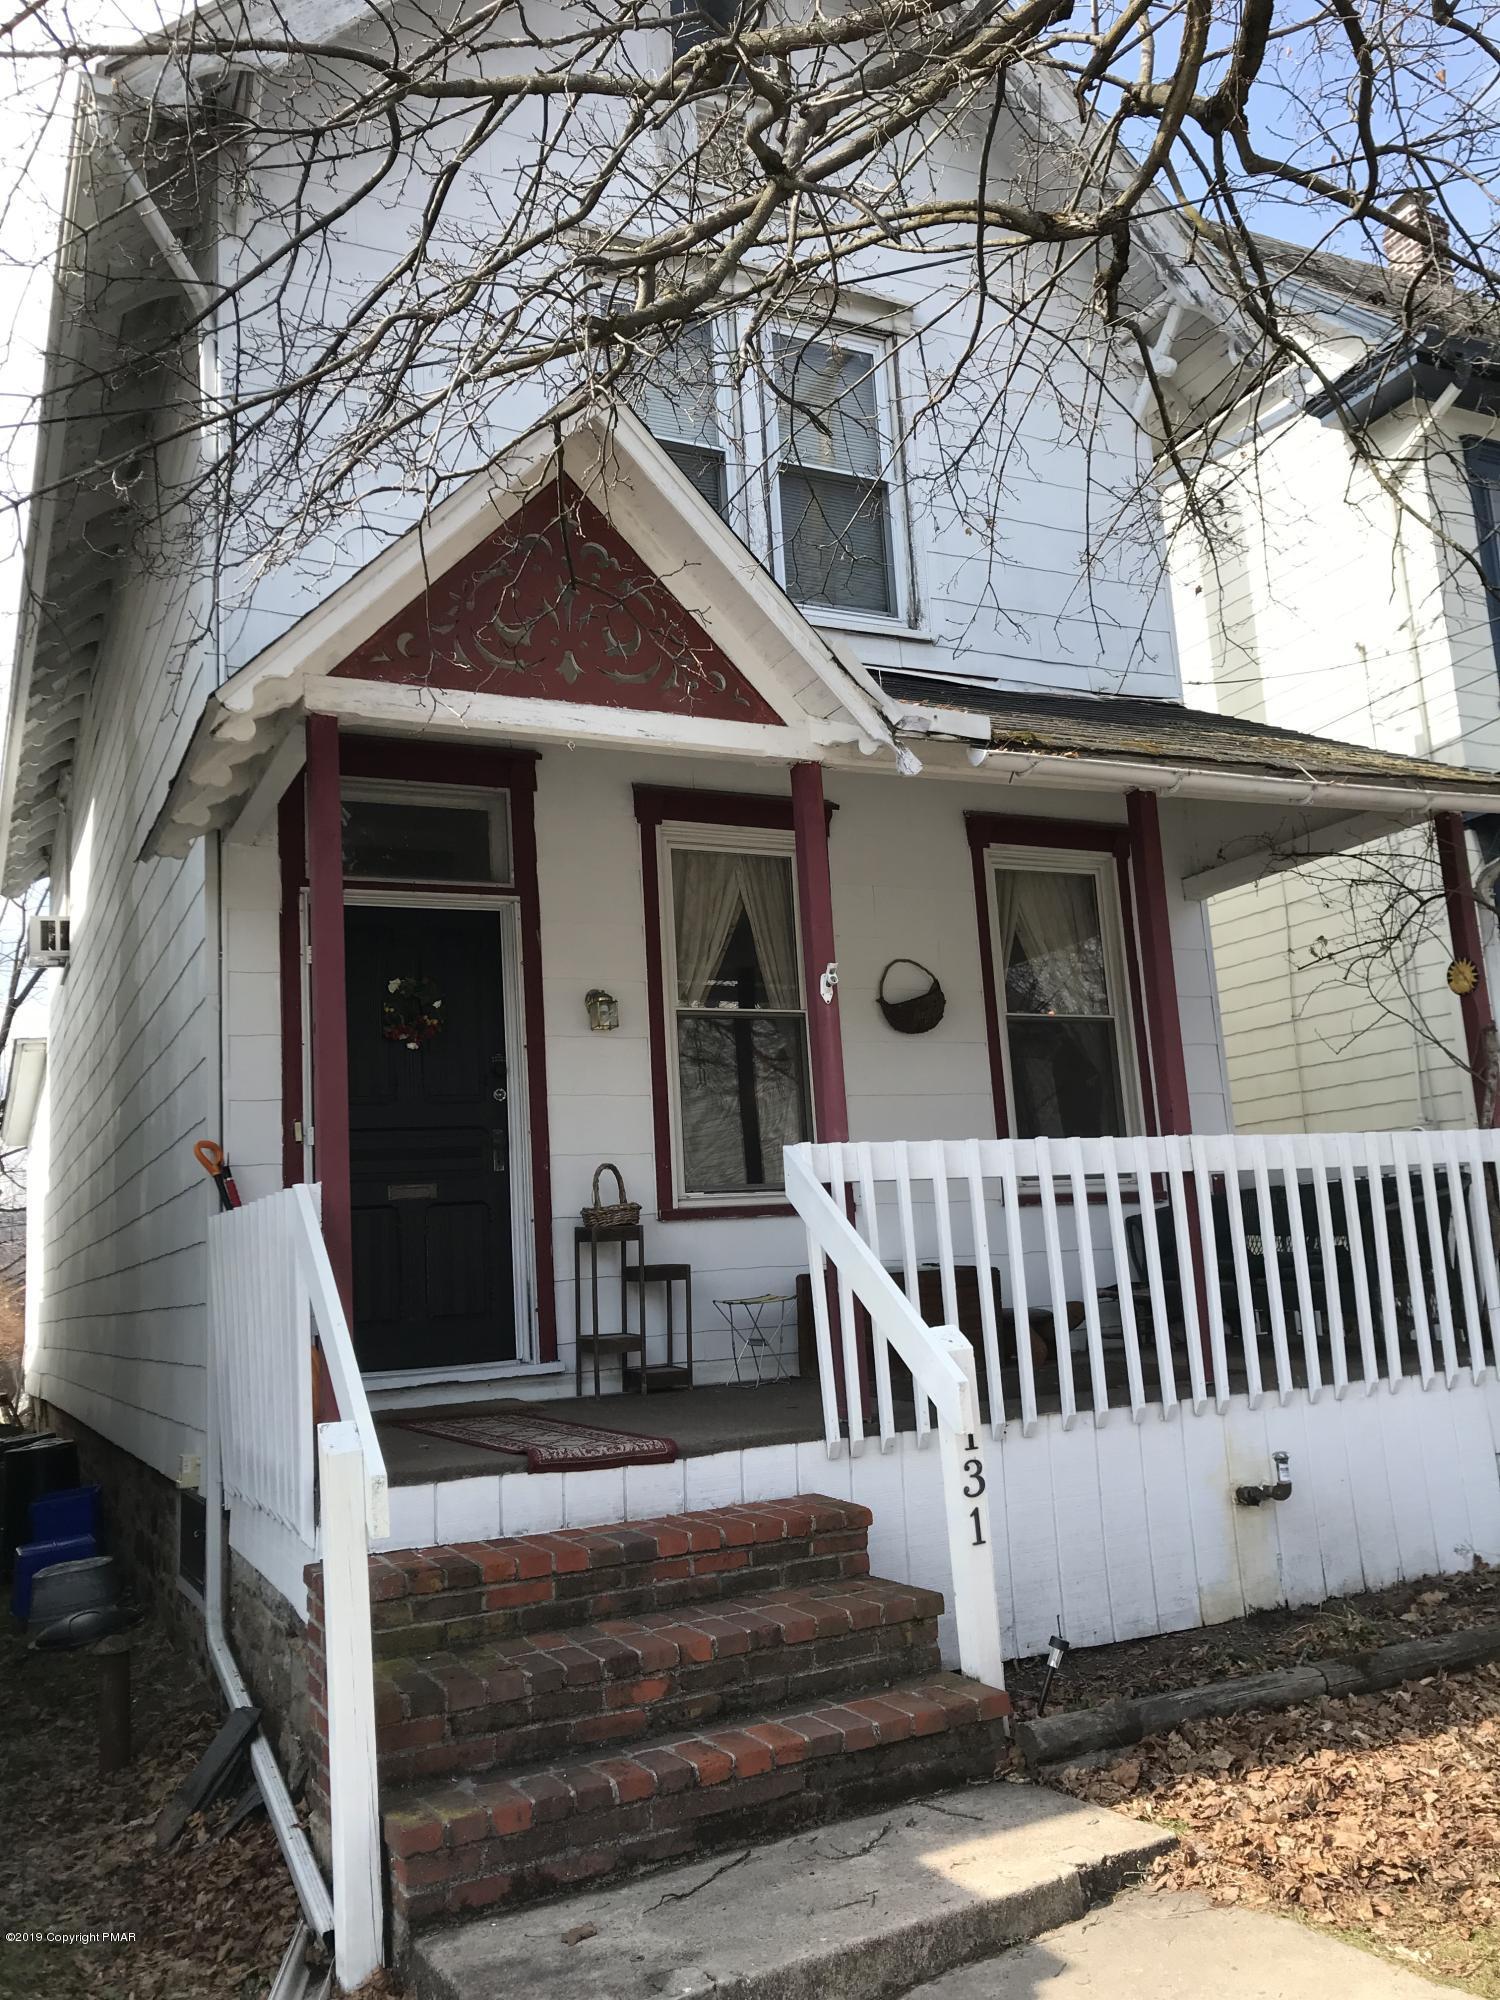 131 S South St, Jim Thorpe, PA 18229